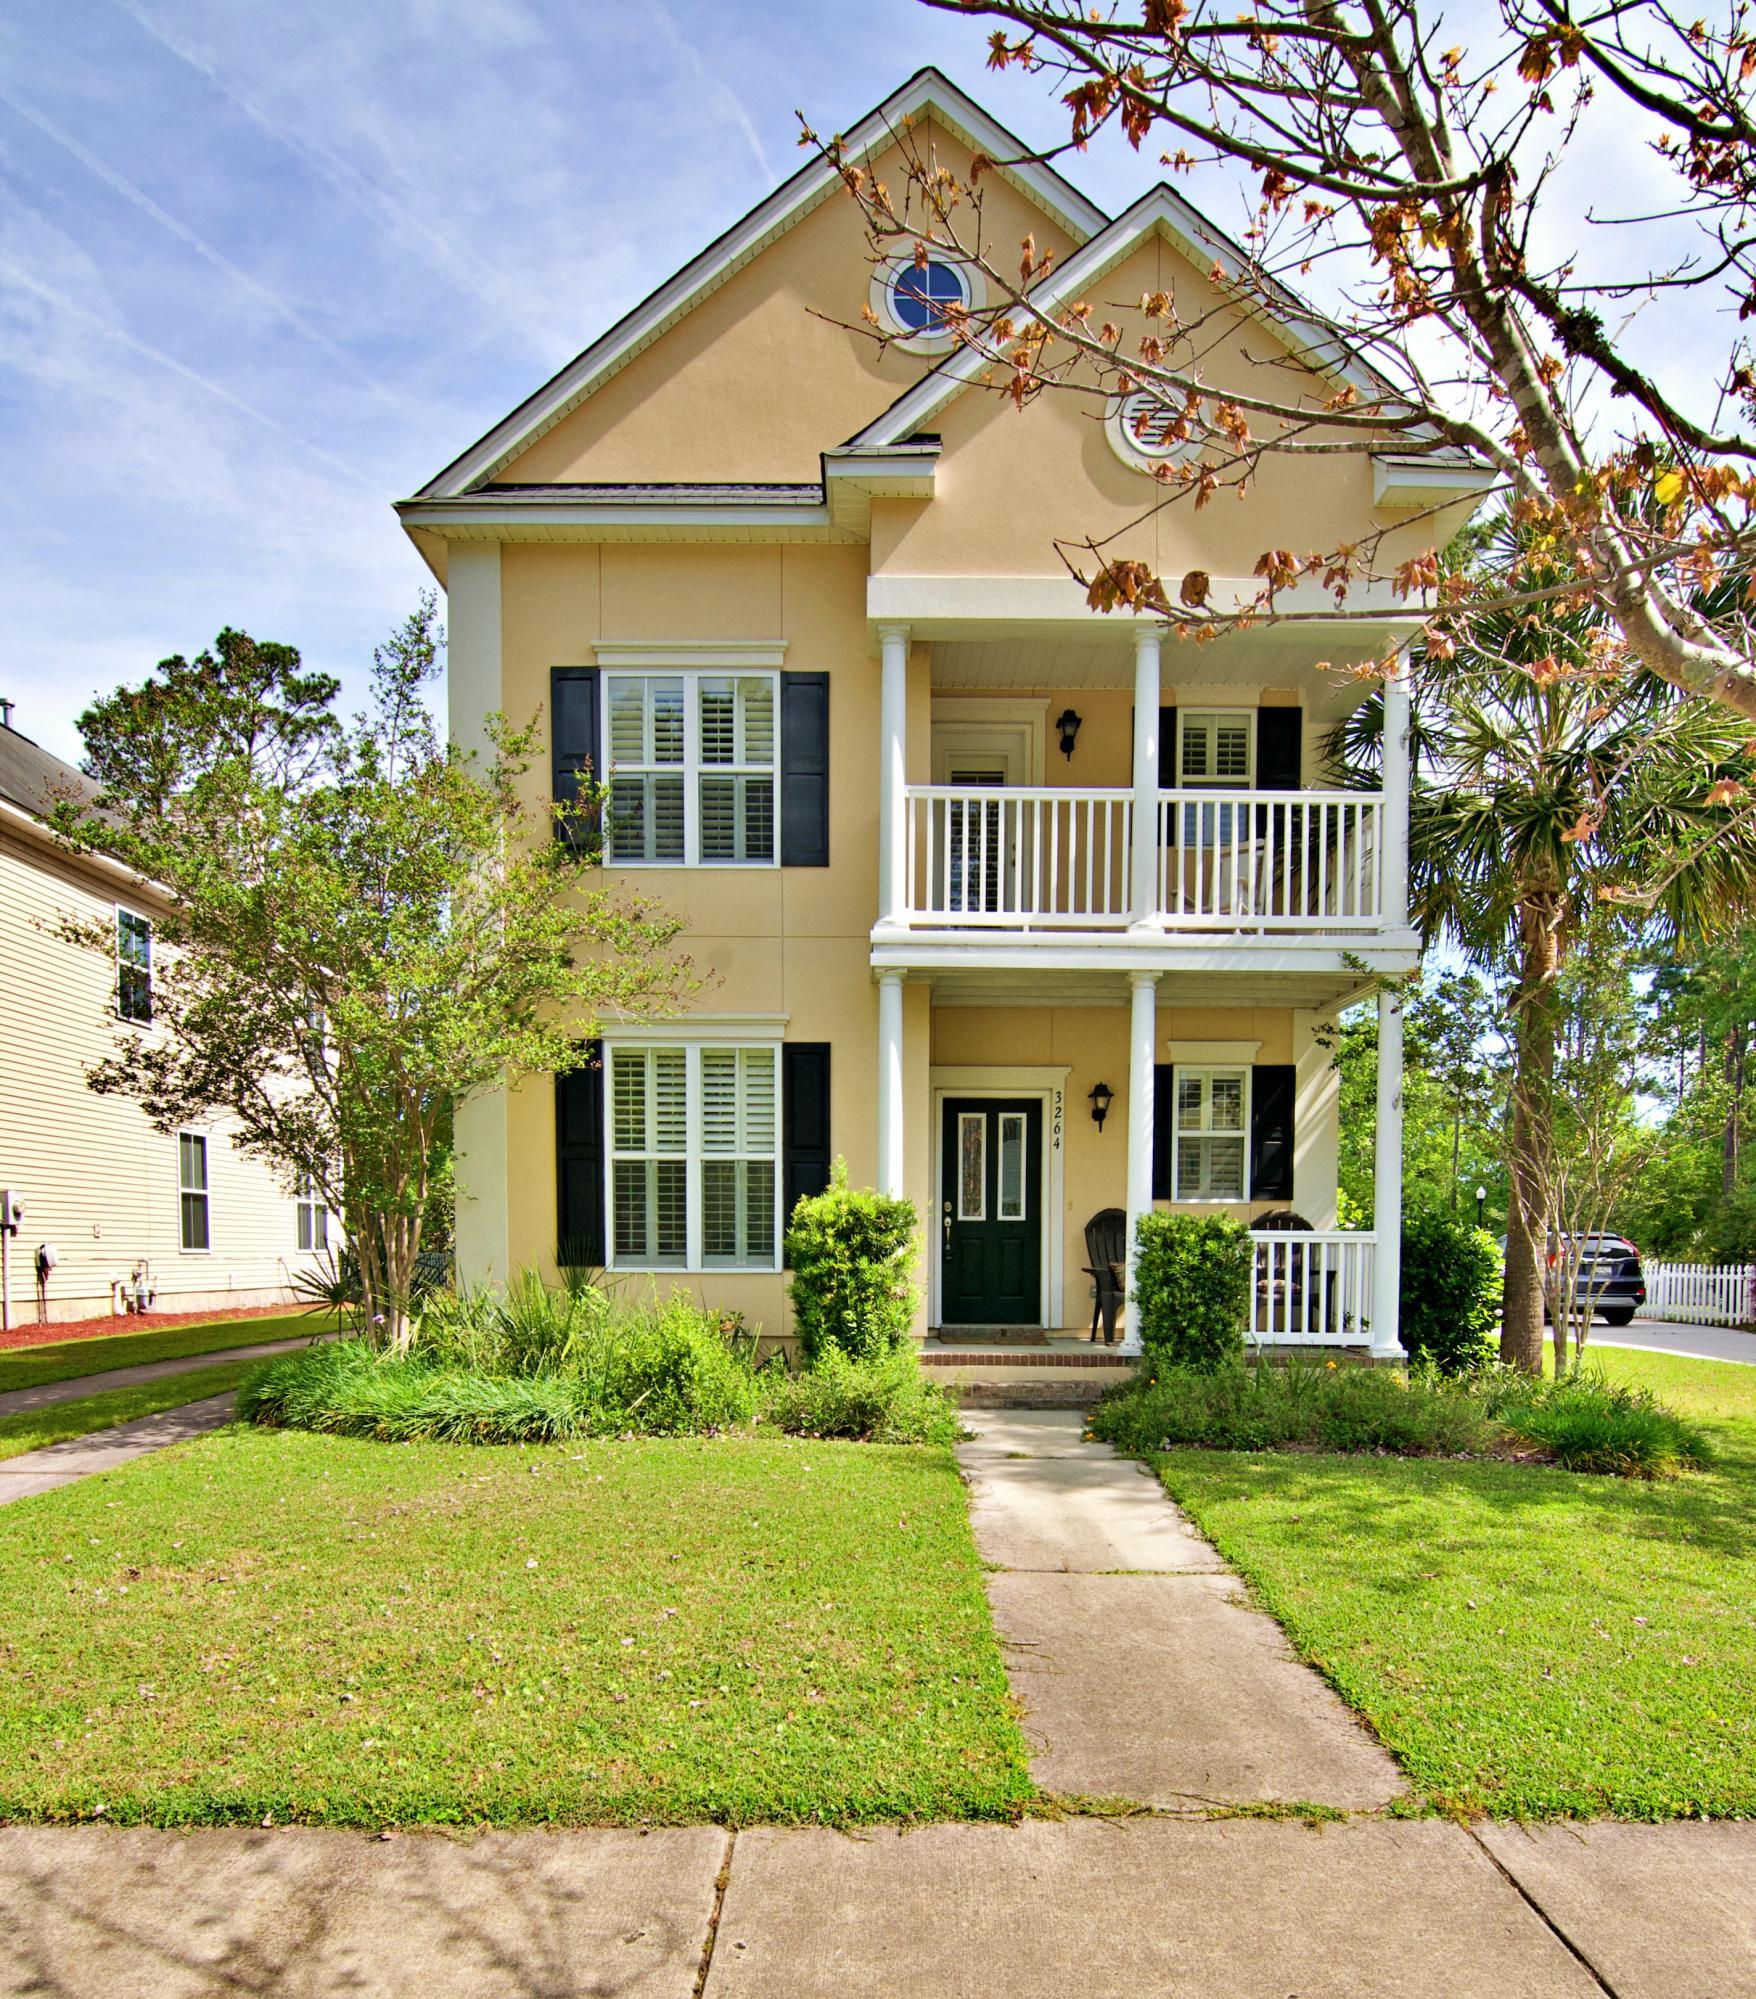 Park West Homes For Sale - 3264 Beaconsfield, Mount Pleasant, SC - 25